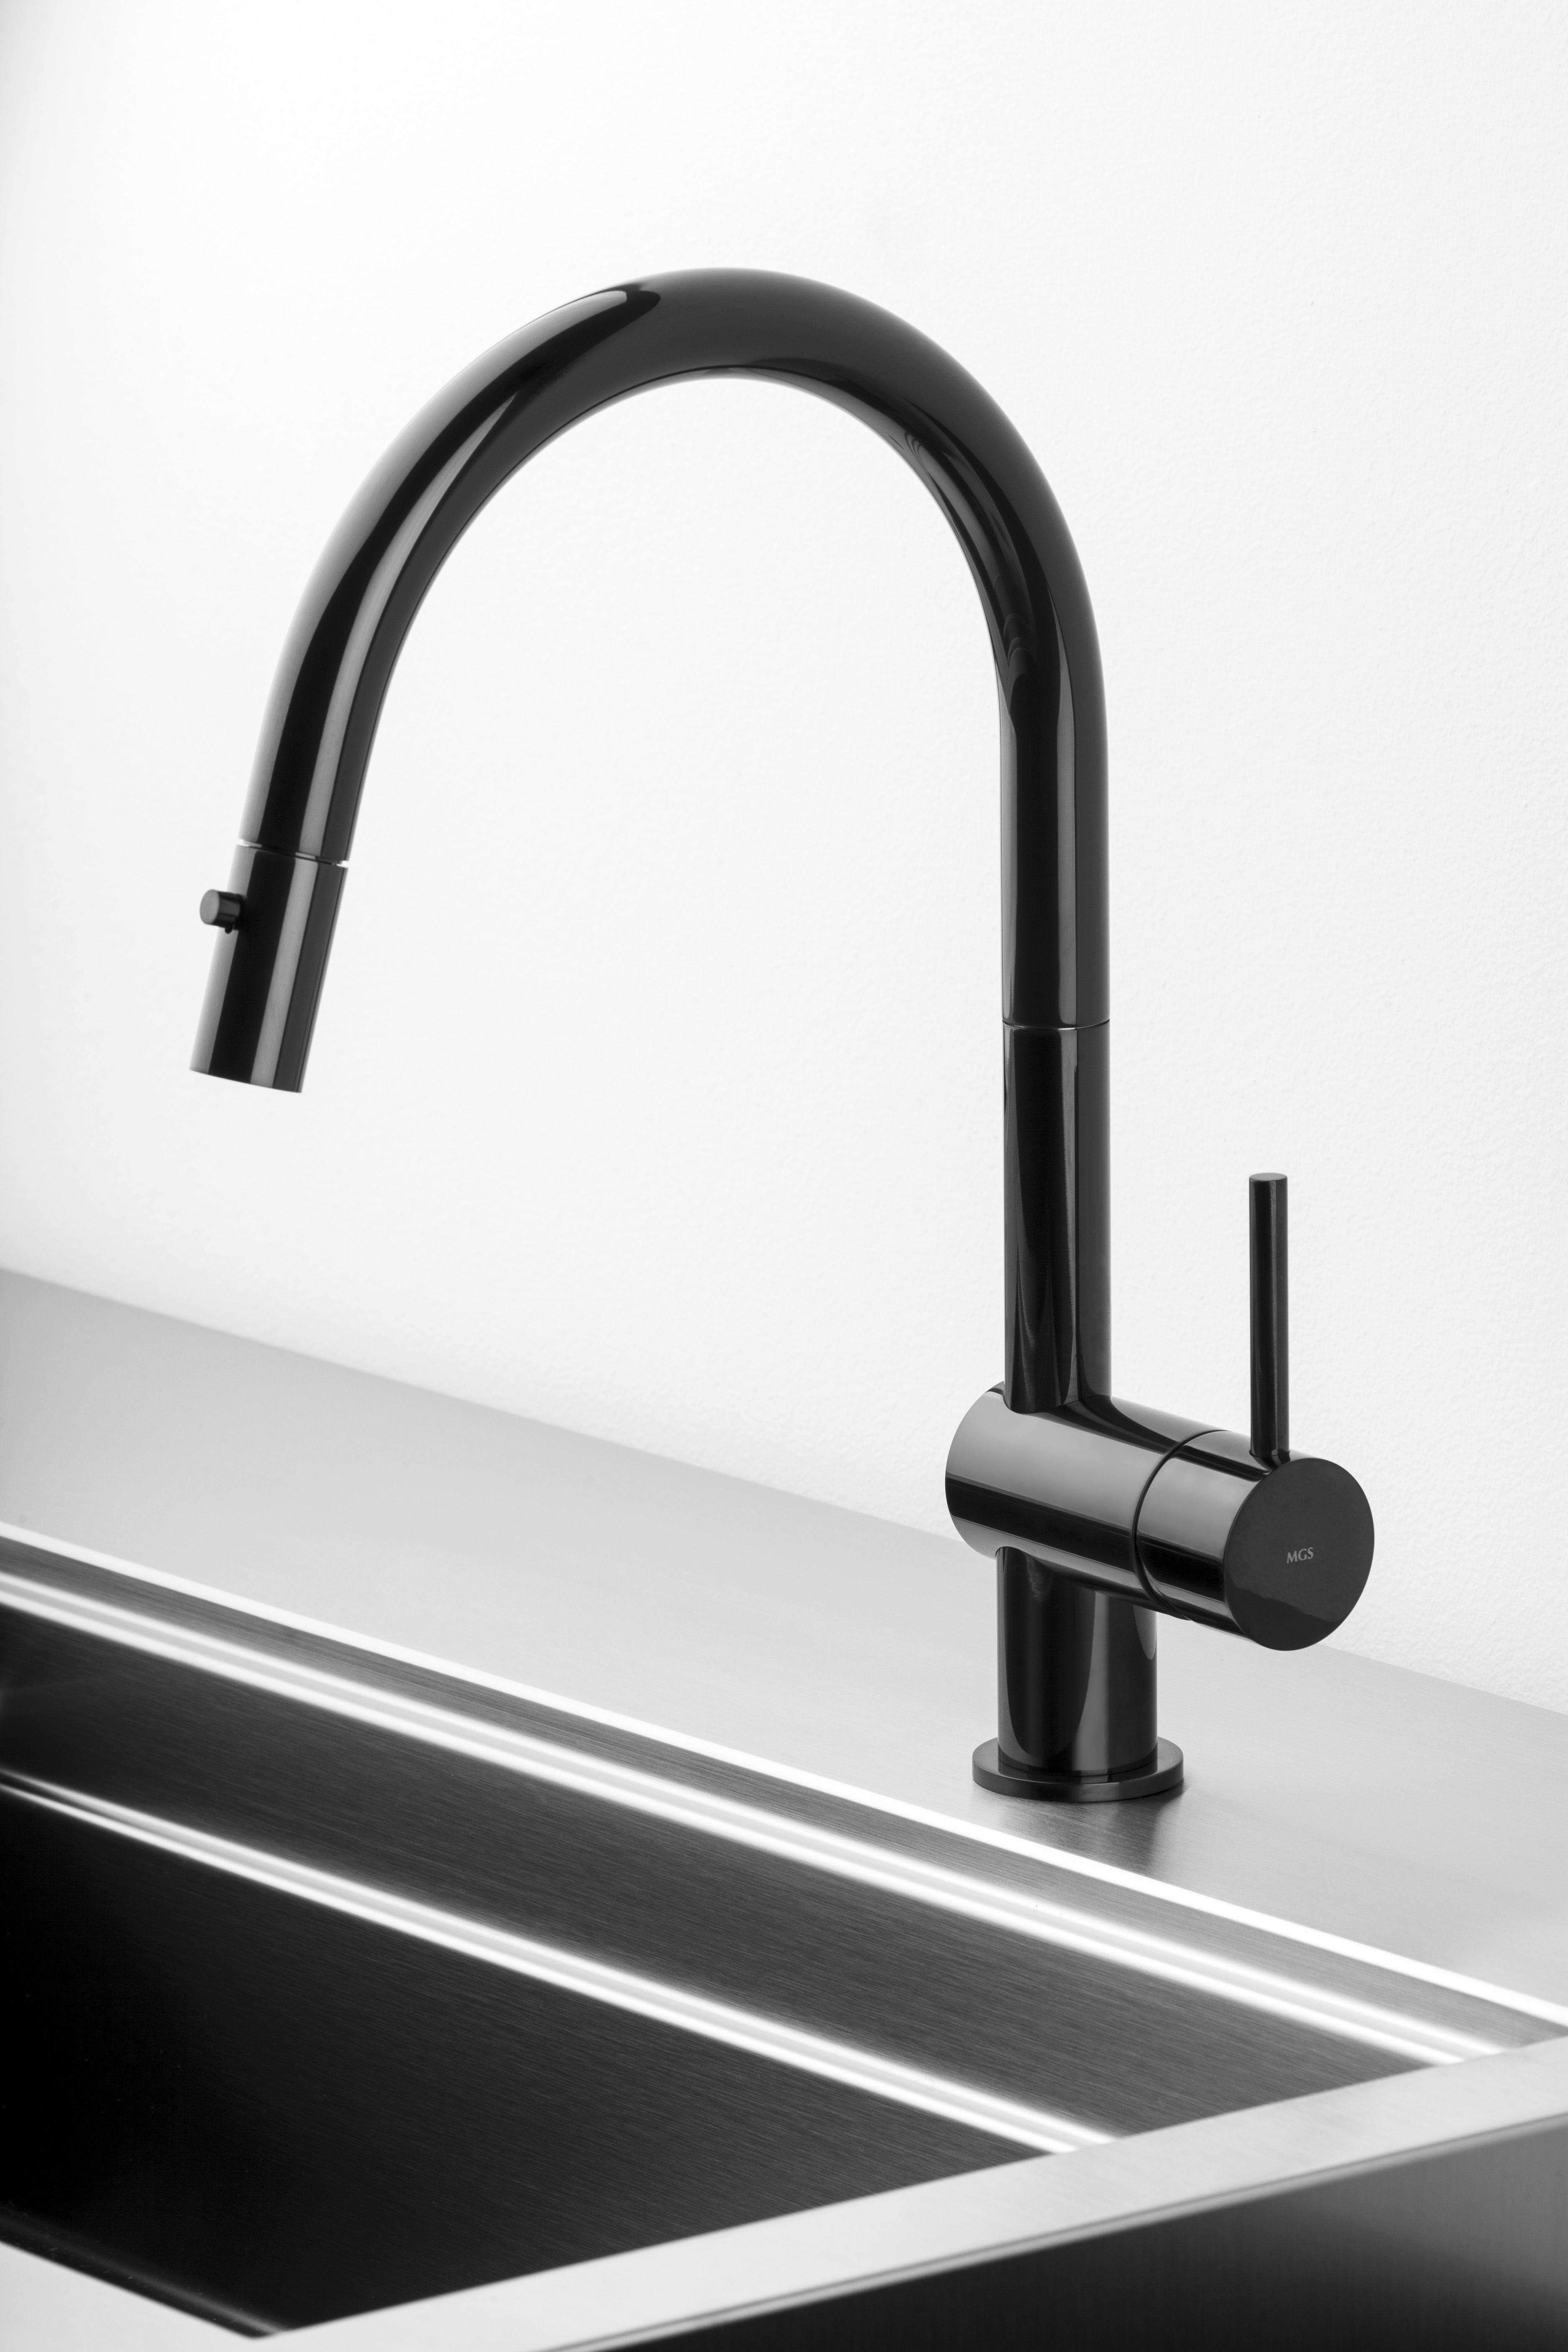 Vela D In Black Onyx Modern Kitchen Faucet Kitchen Faucet Stainless Kitchen Faucet